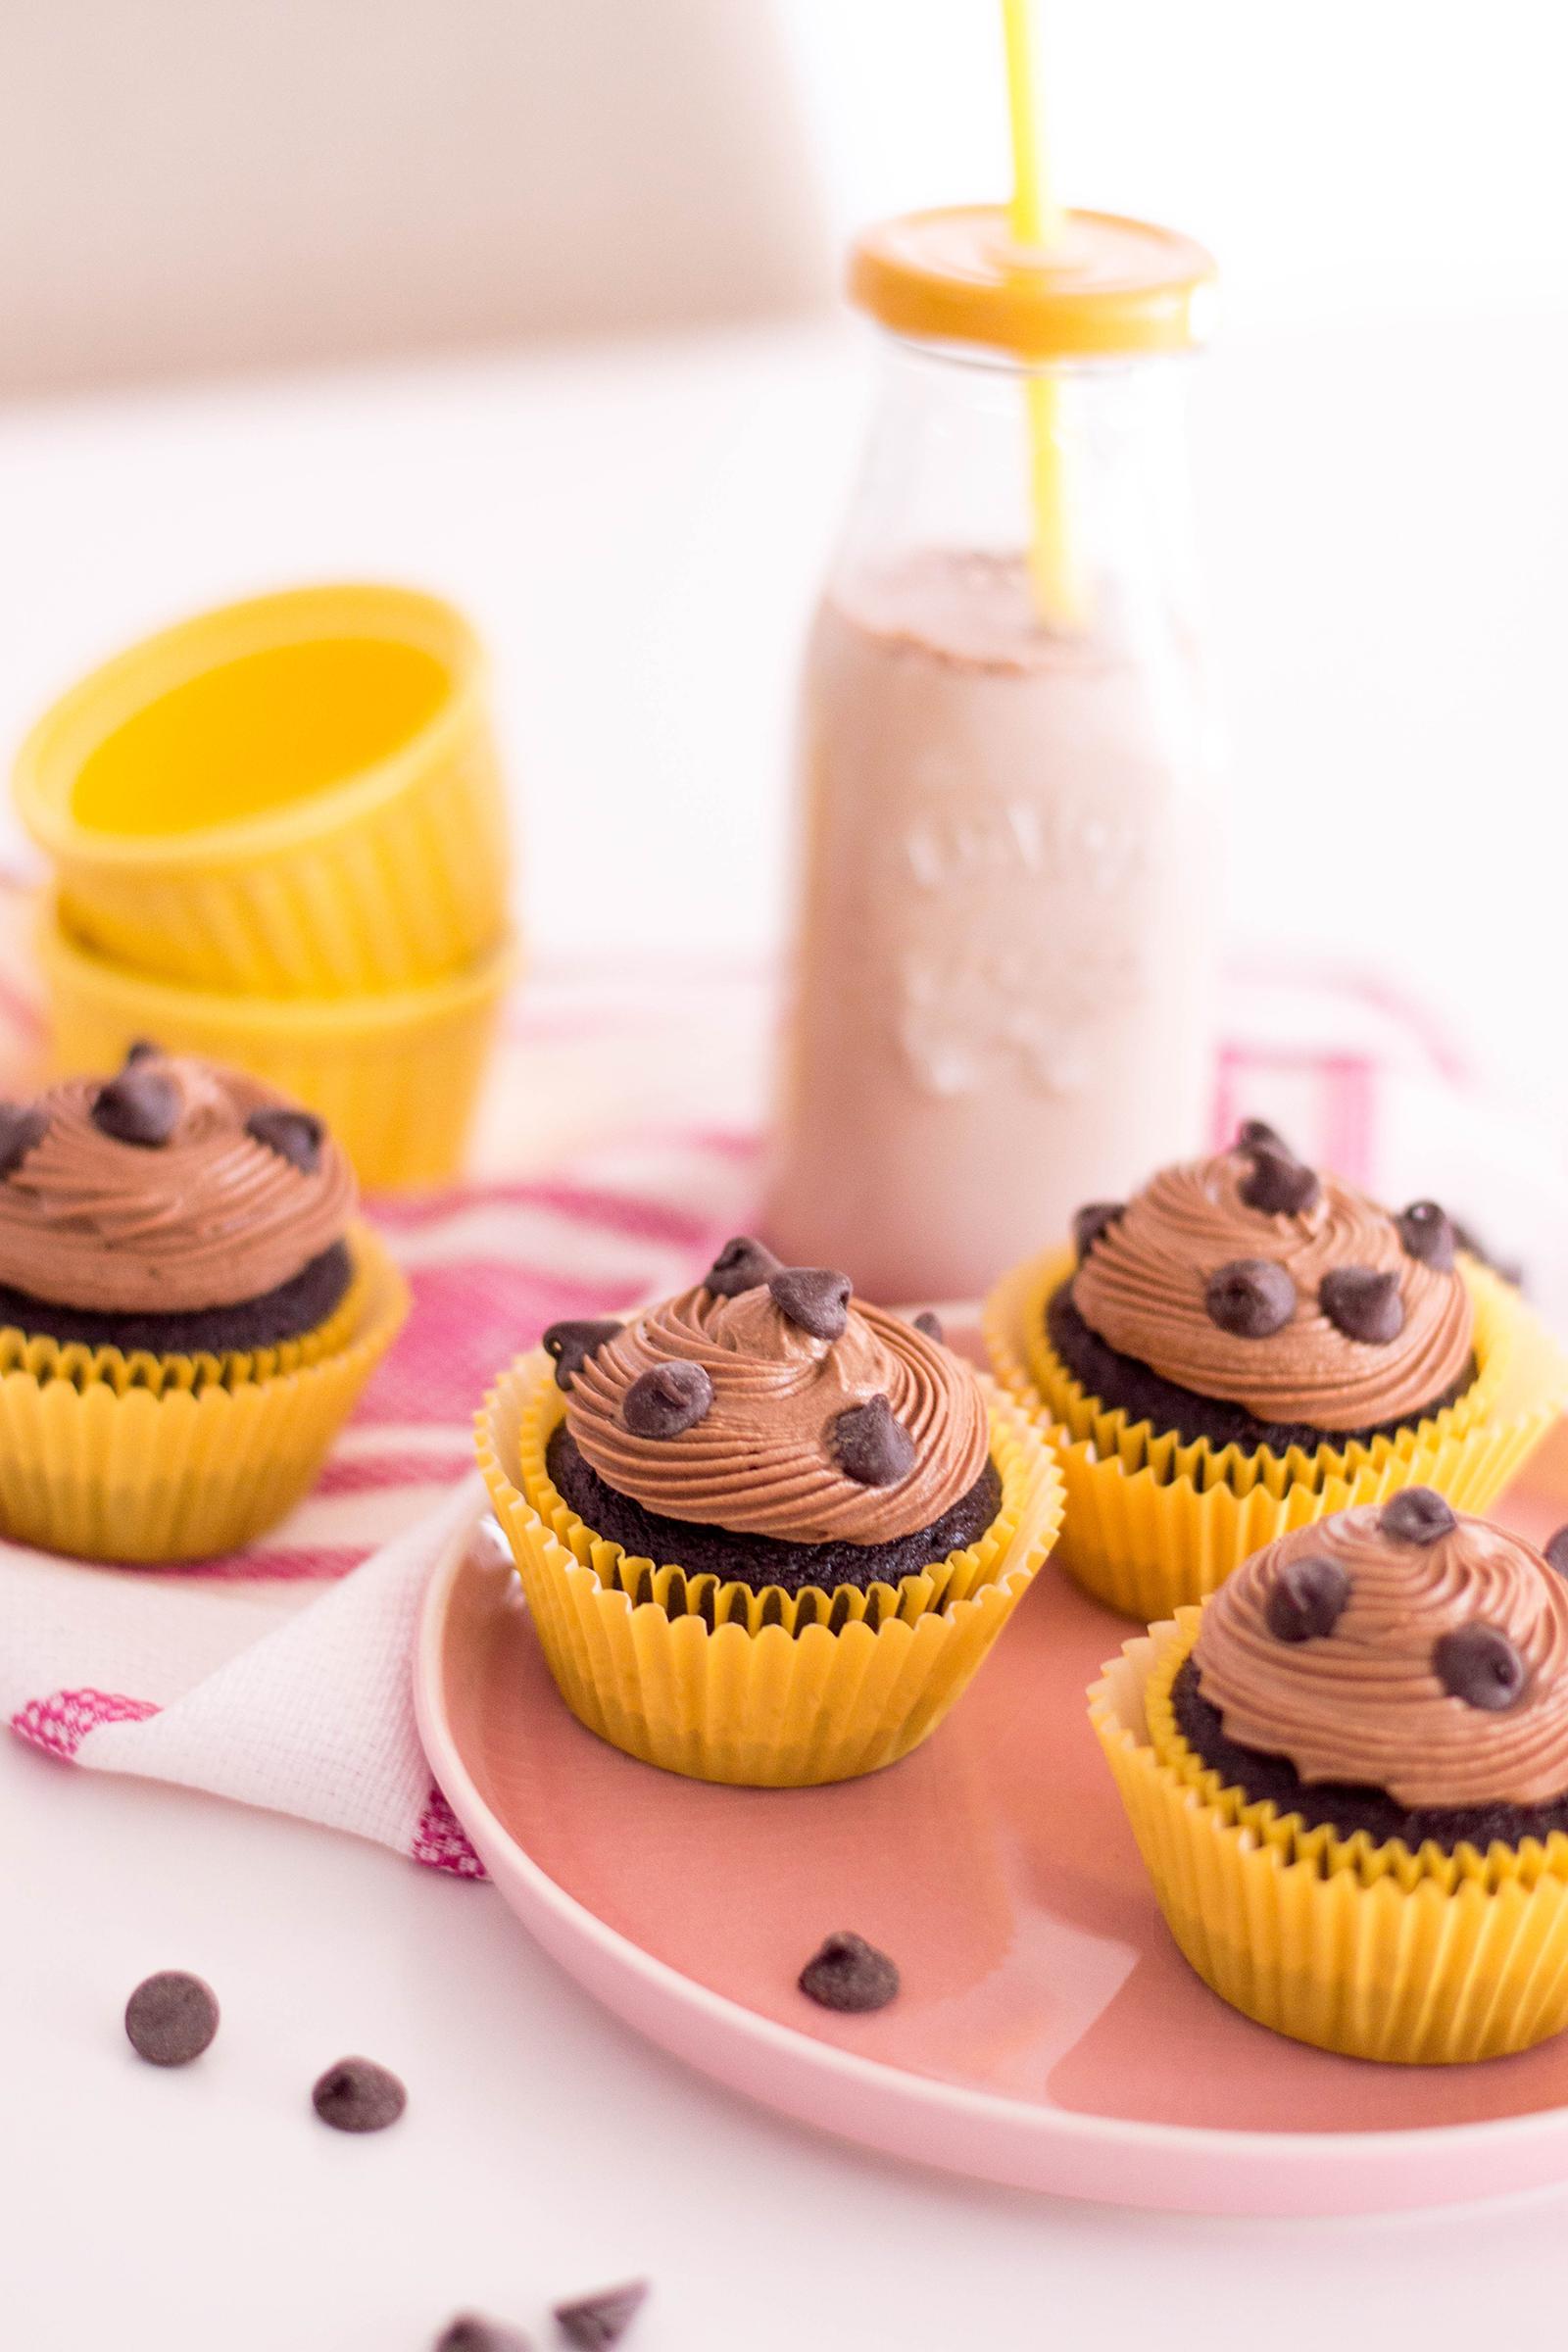 Easy Chocolate Cupcake Recipe: with Double Chocolate & Chocolate Milk